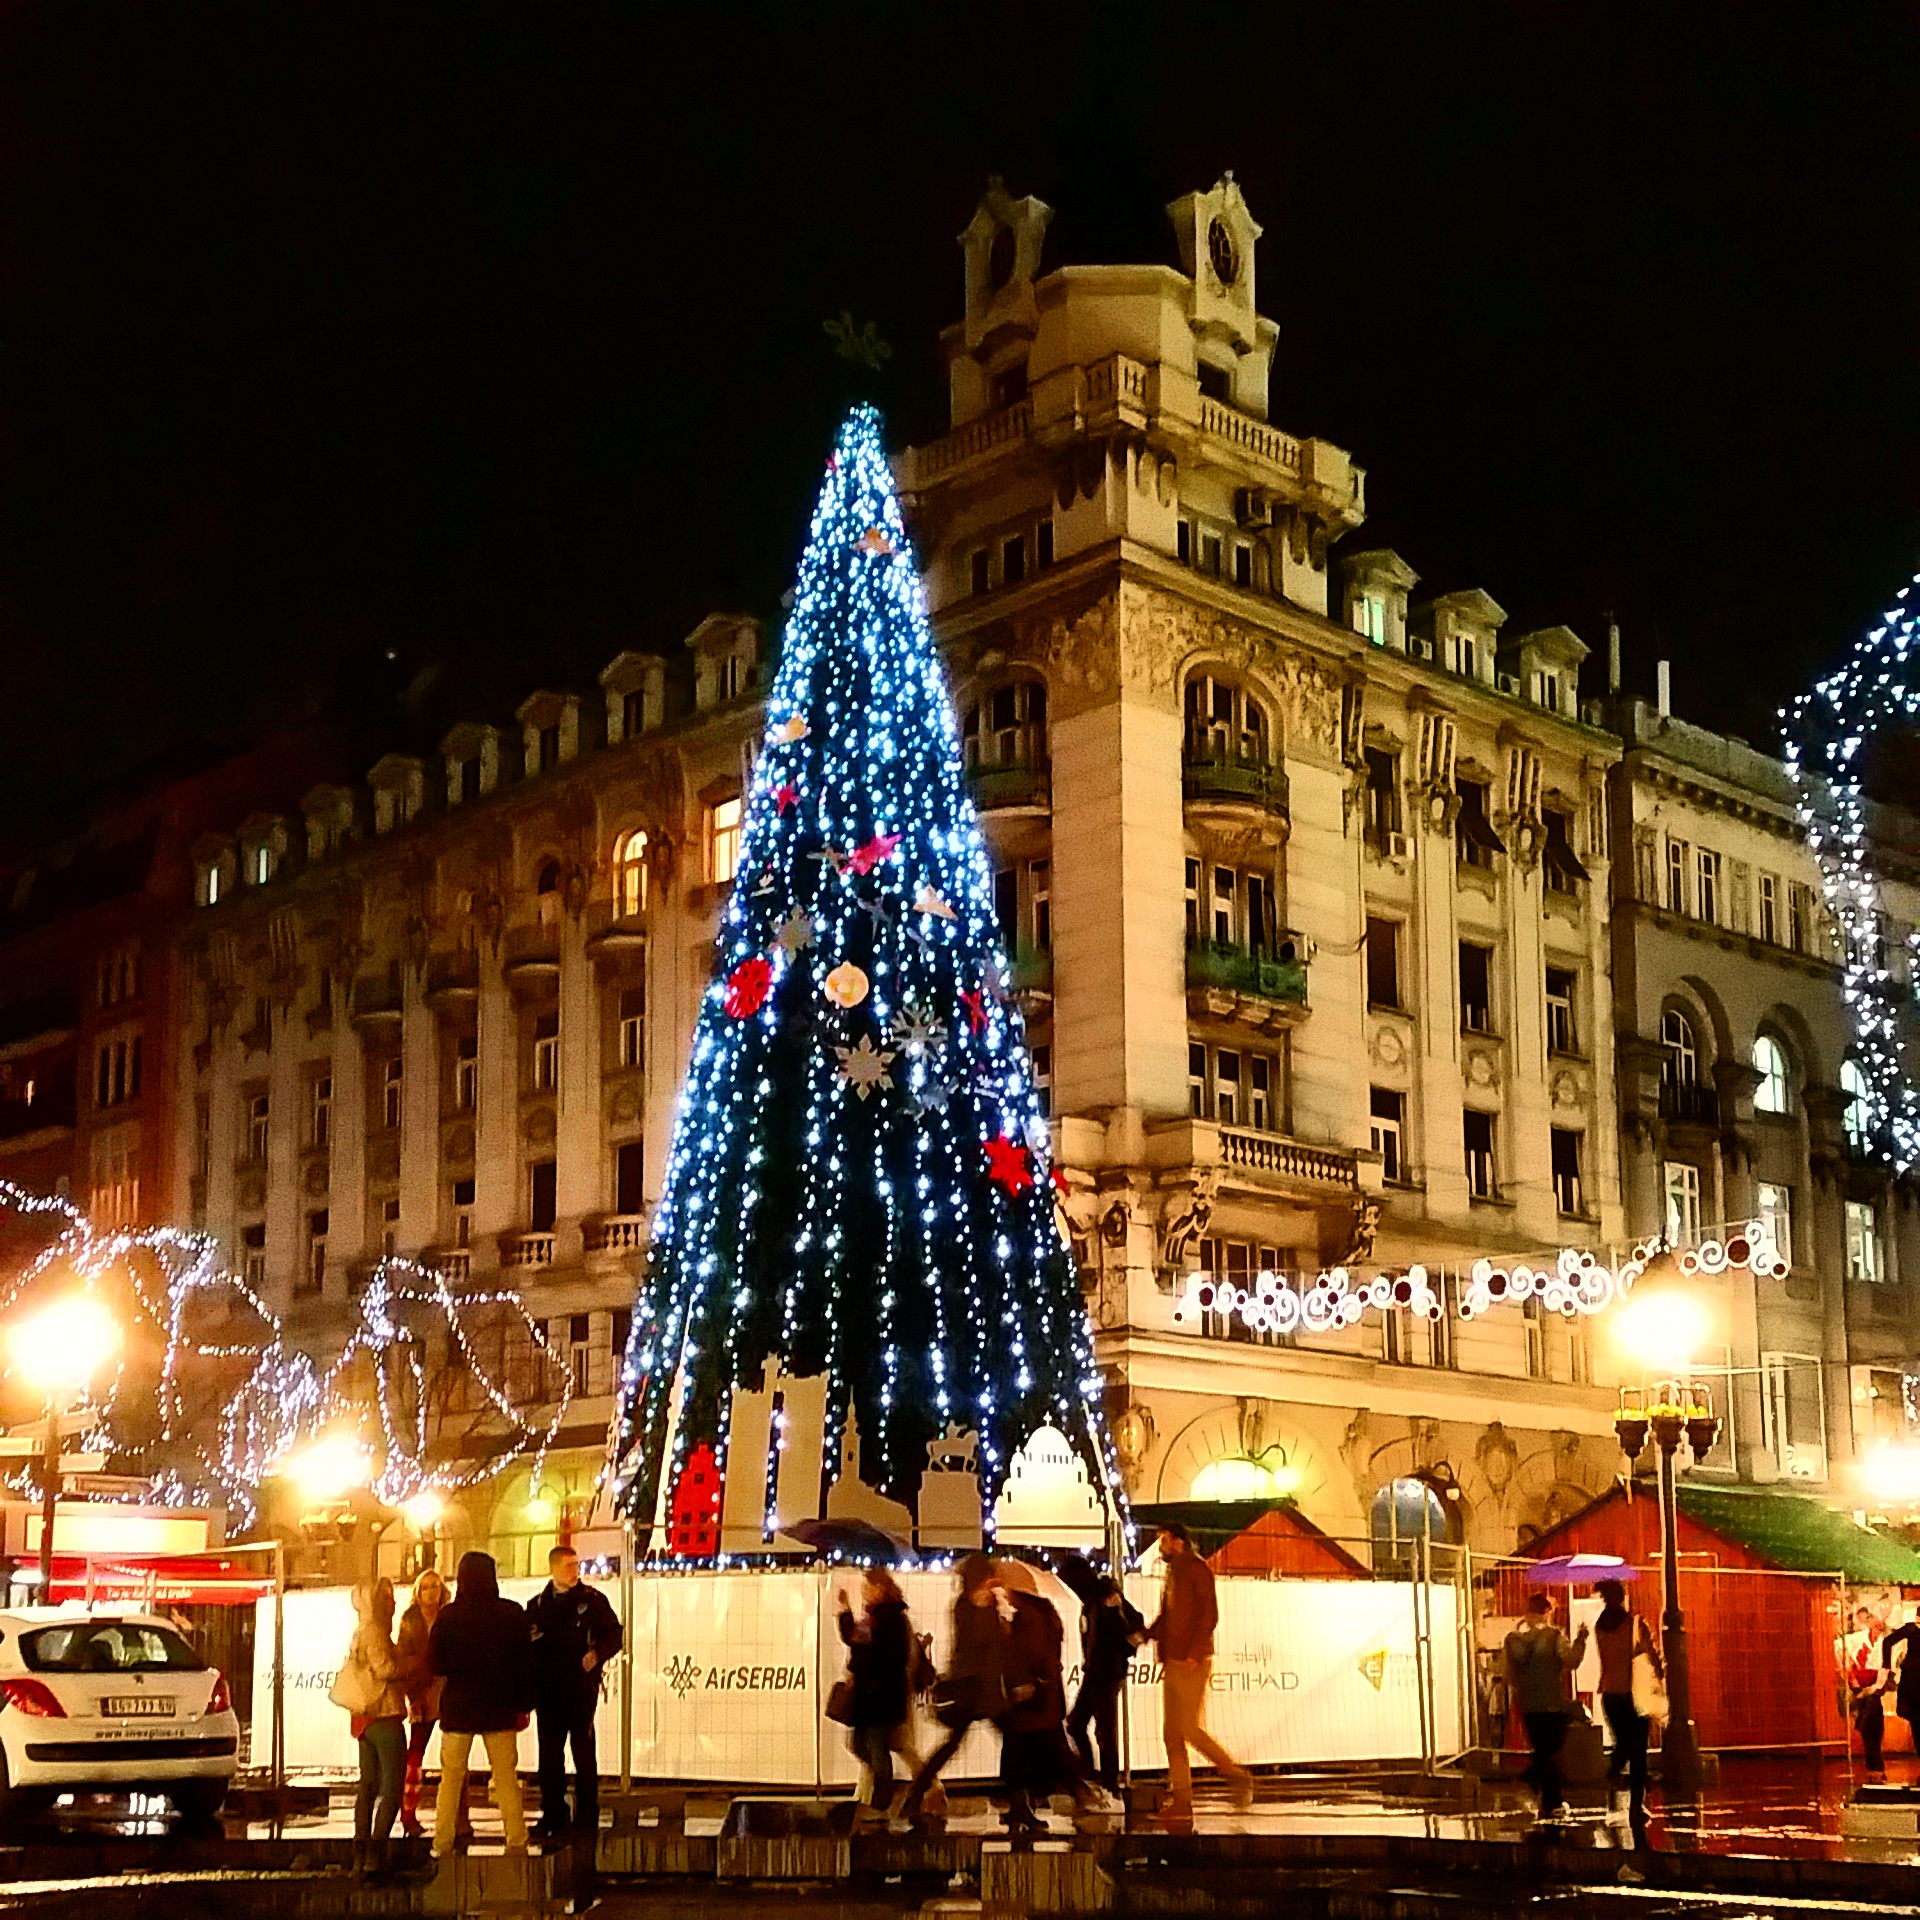 Festoni Krishtlindjet ne  Beograd